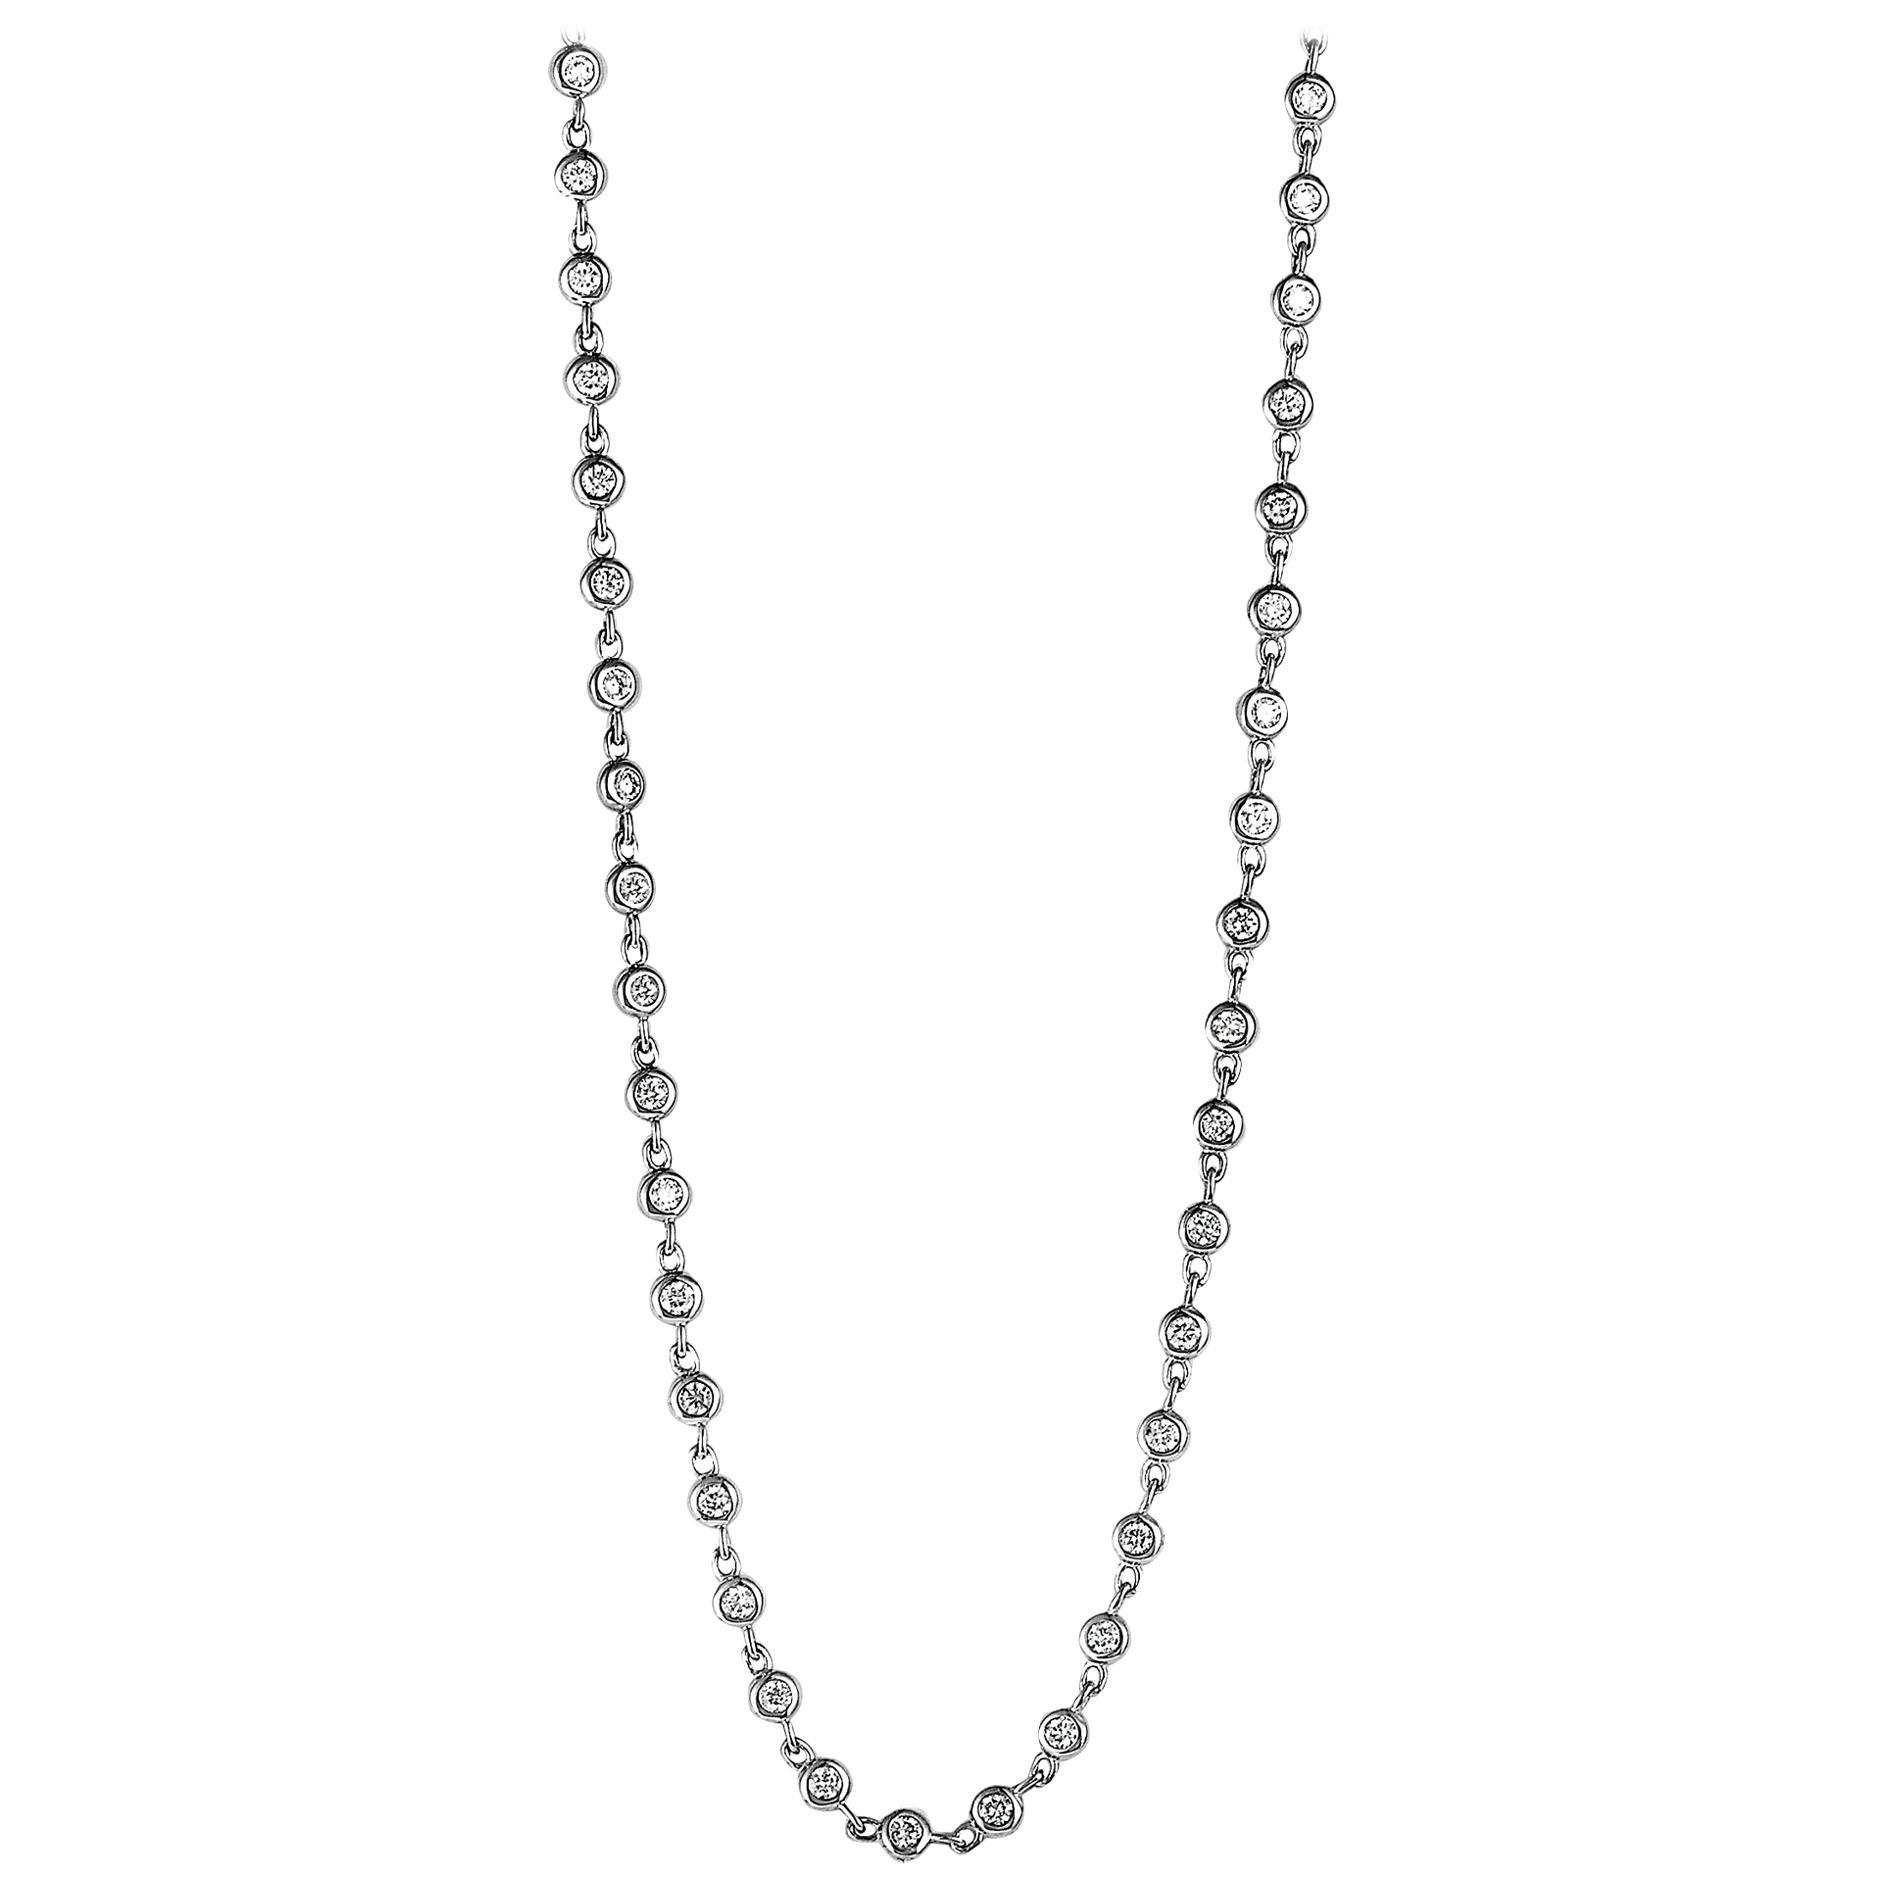 Lb Exclusive 18 Karat Yellow Gold Round Diamonds Sautoir Long Necklace With Regard To 2019 Diamond Sautoir Necklaces In Yellow Gold (View 13 of 25)